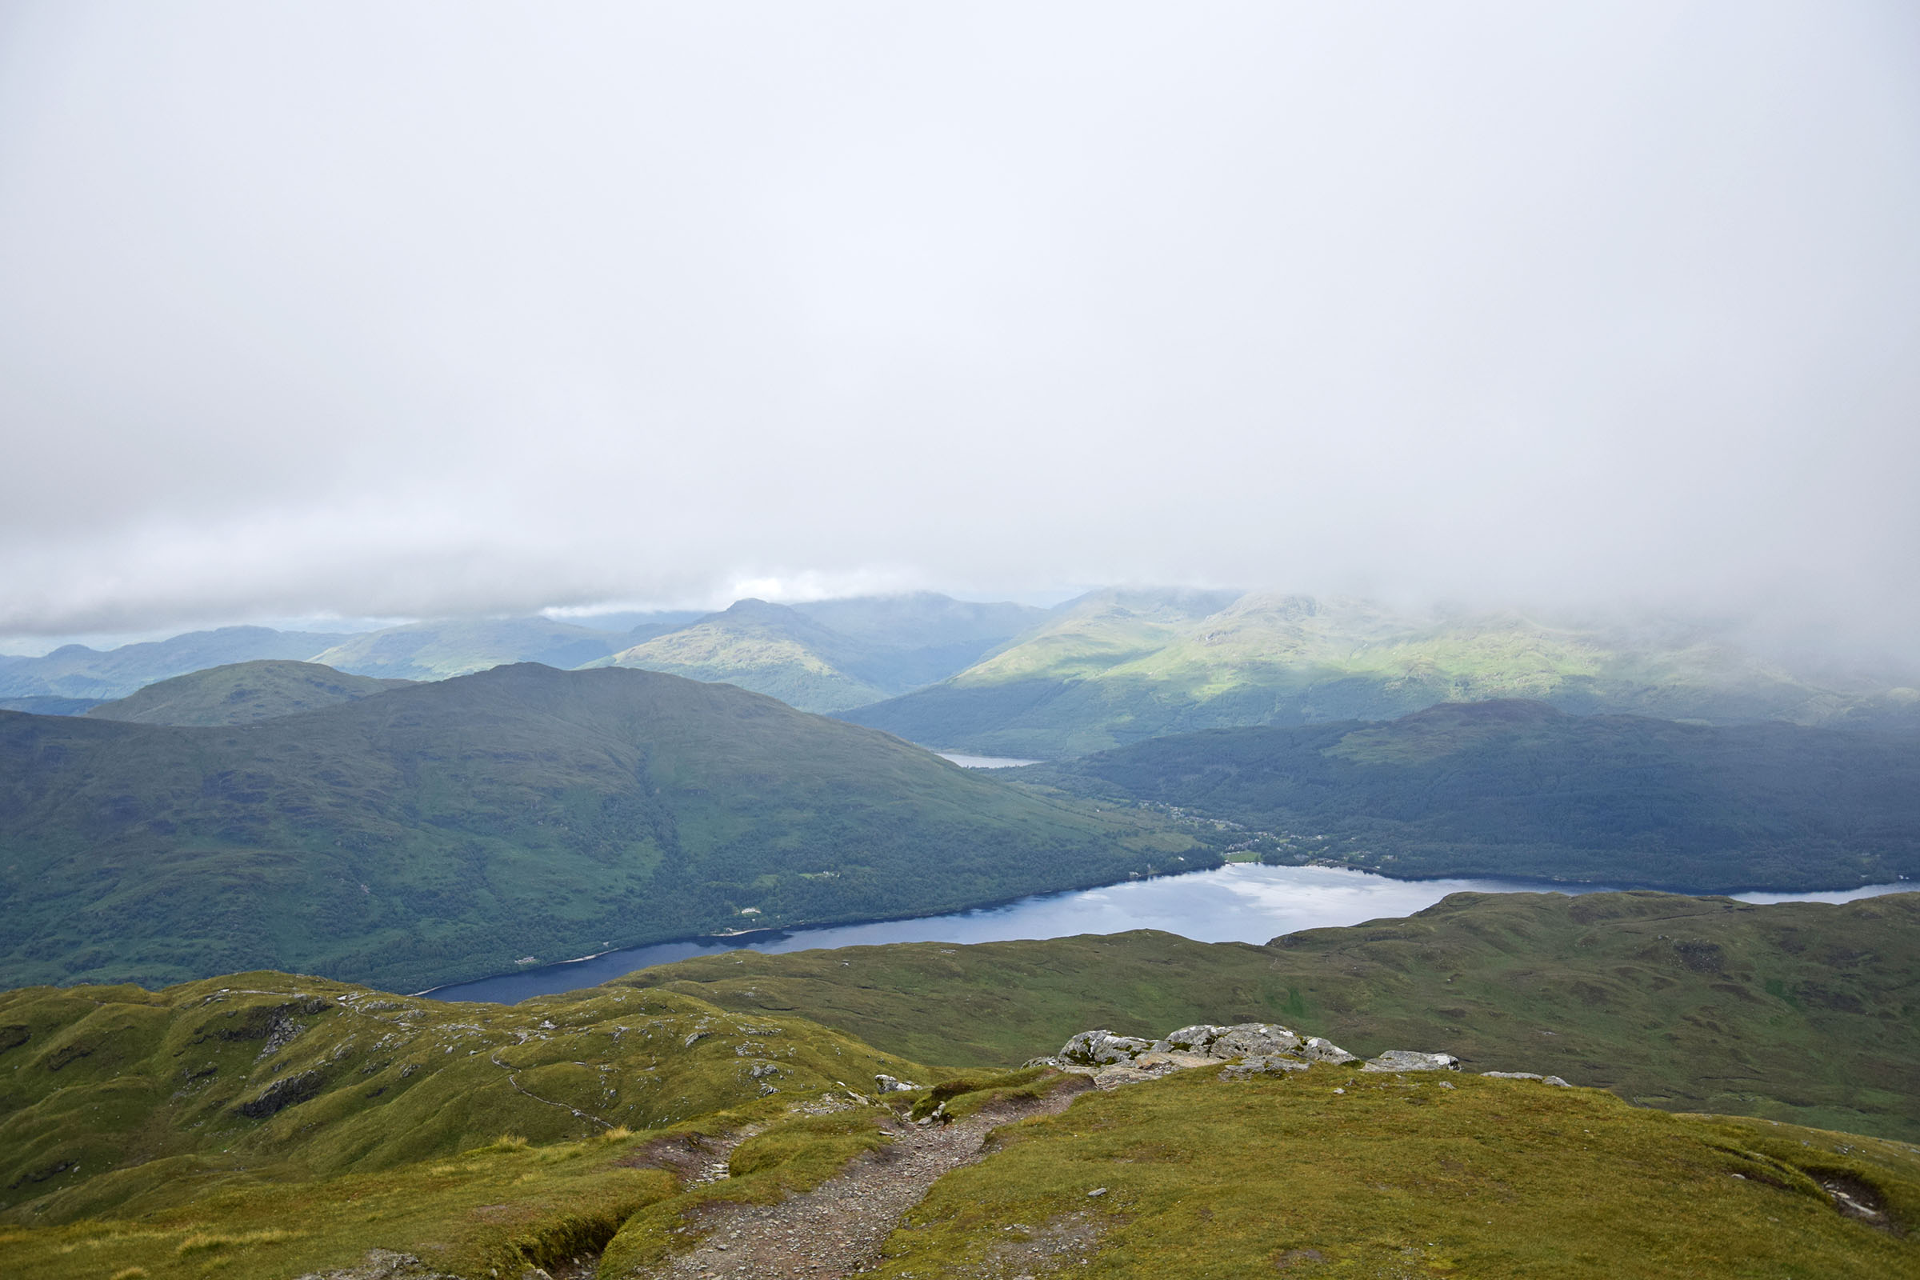 10 Gipfelausblick auf Loch Lomond